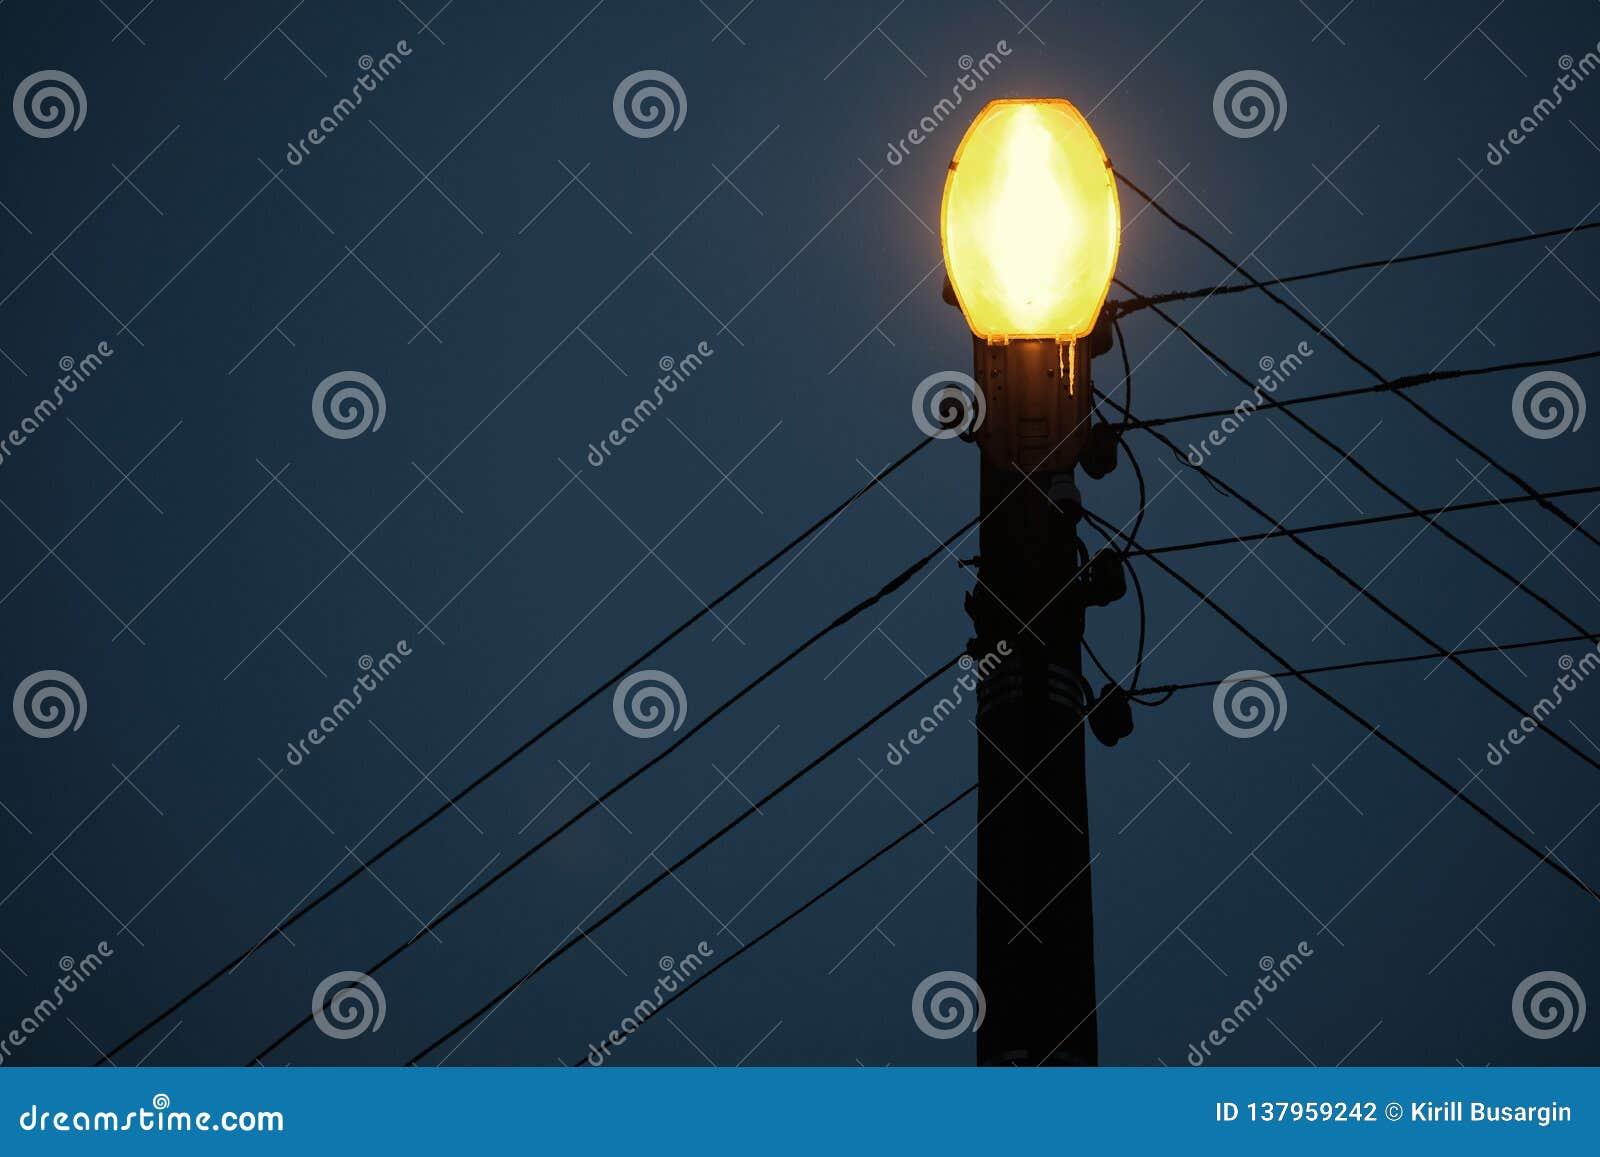 A hanging street lamp against a serene dark sky